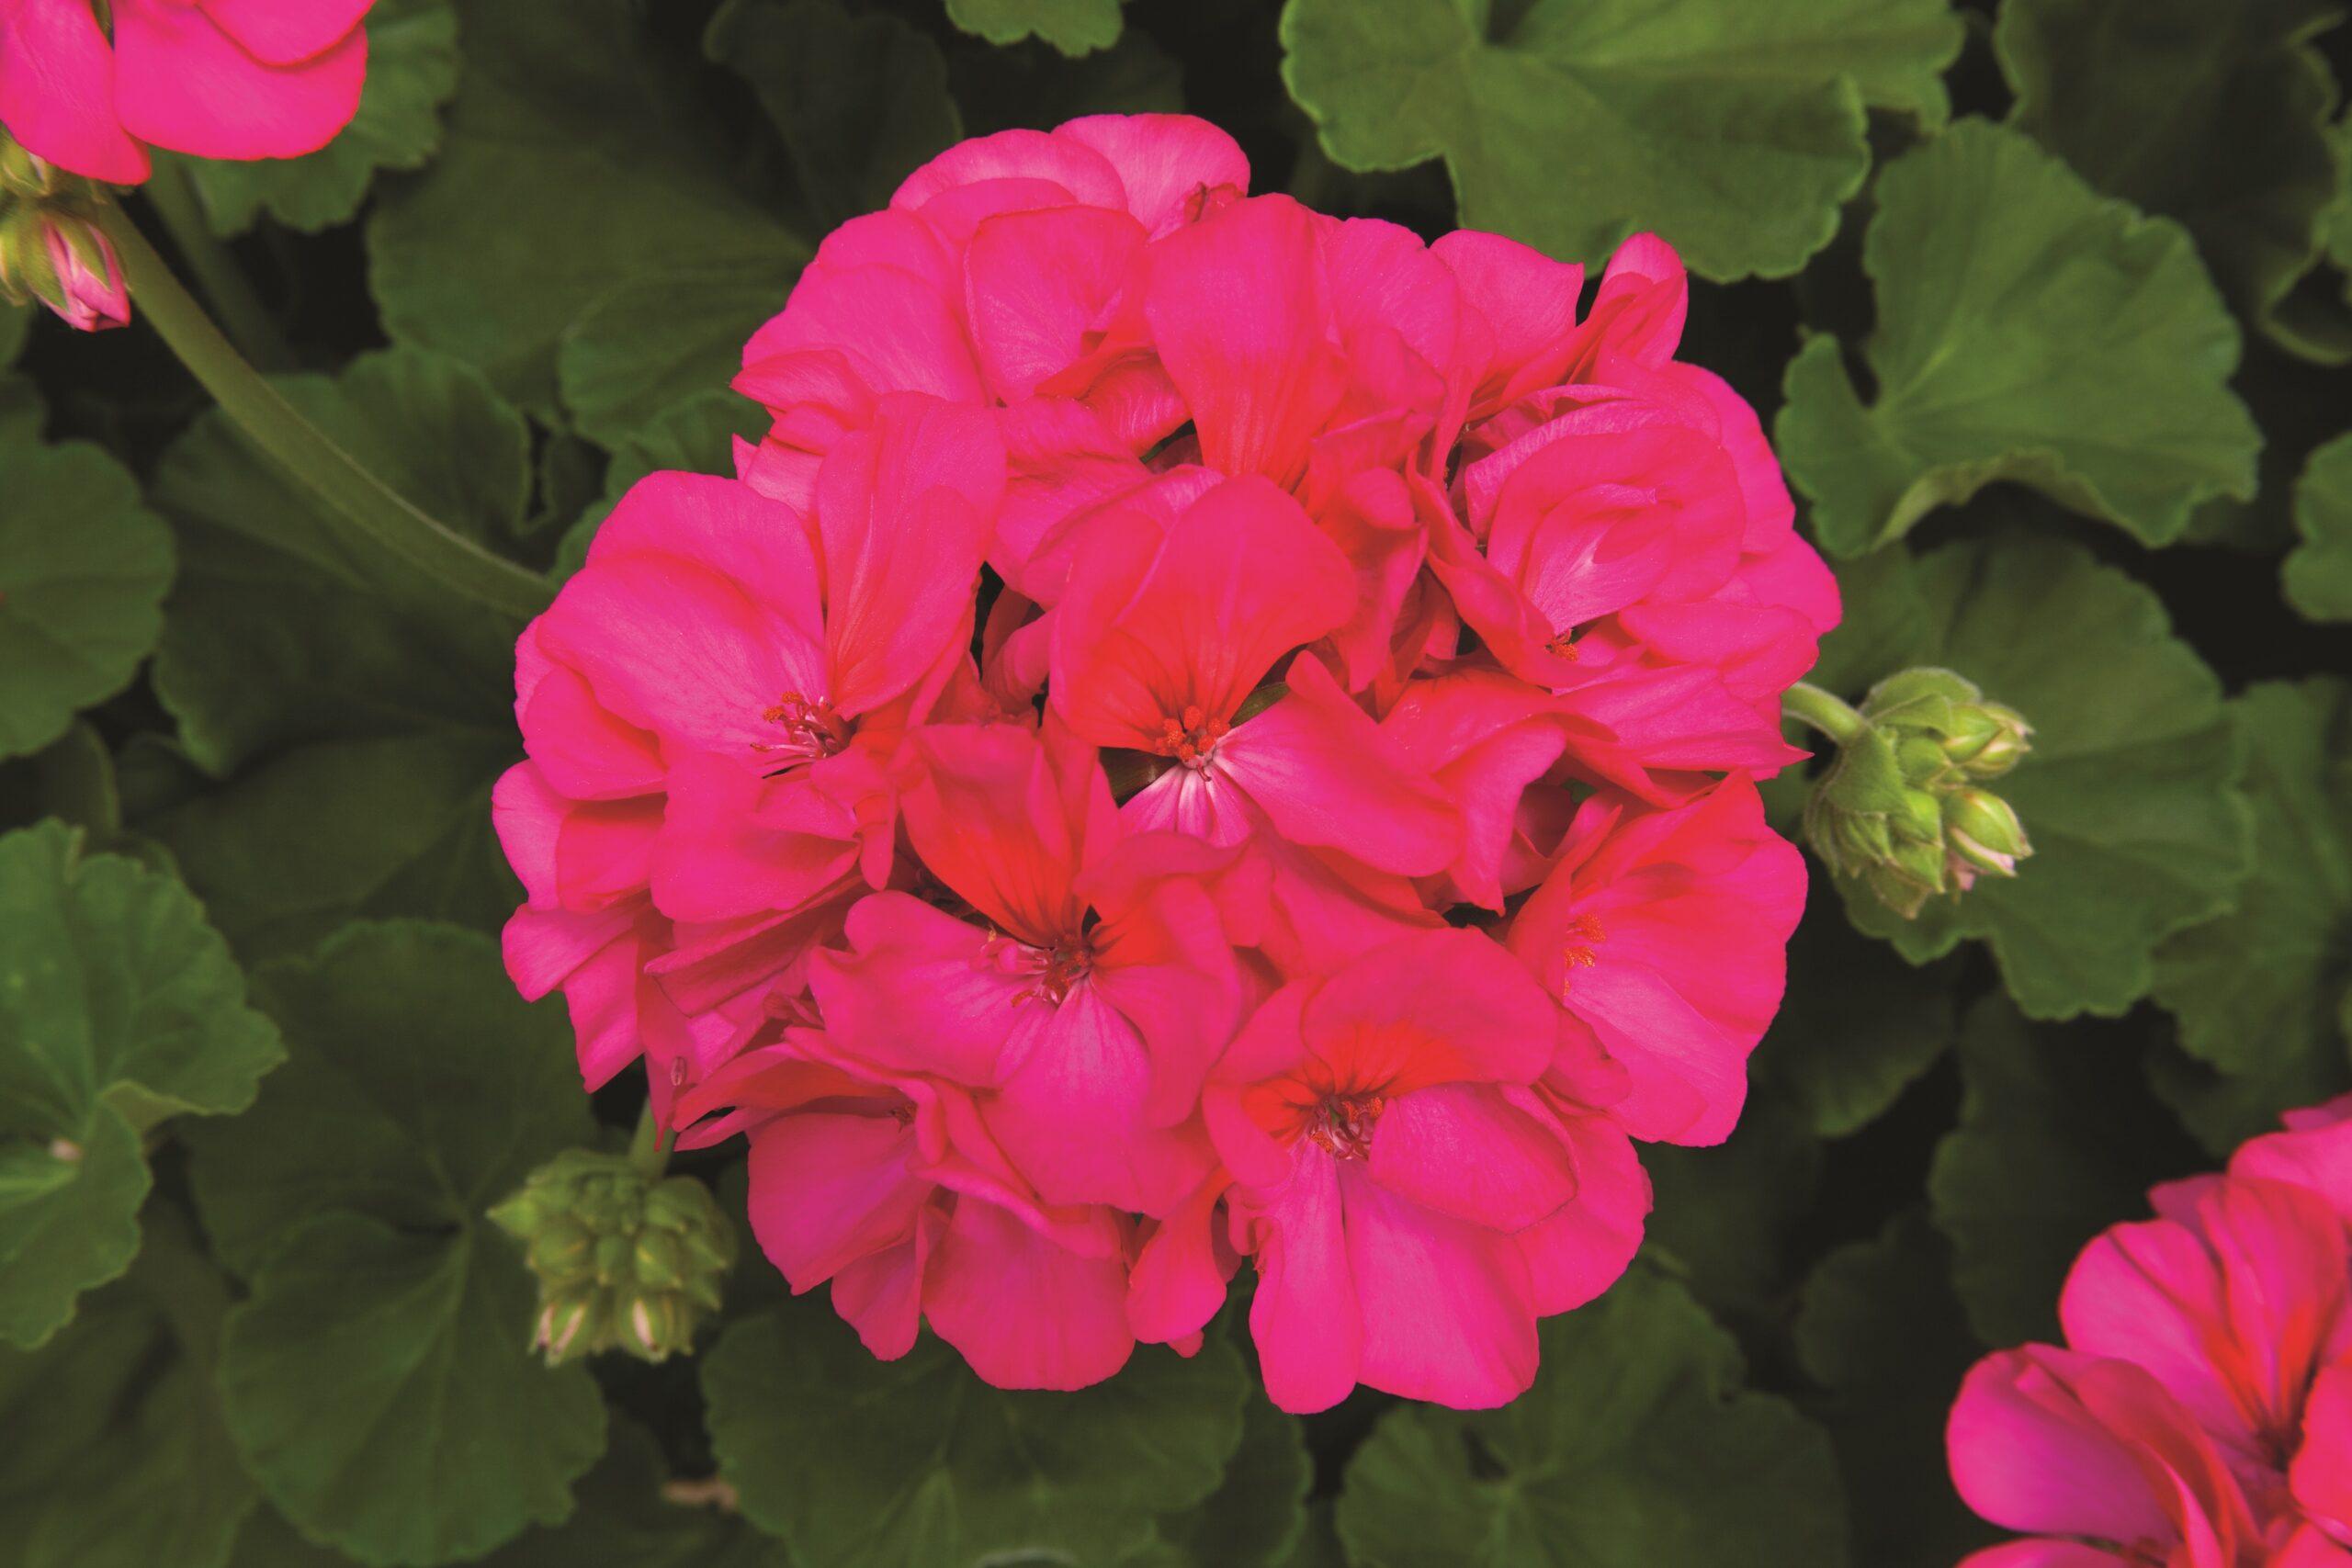 Geranium - Zonal Rocky Mountain Violet